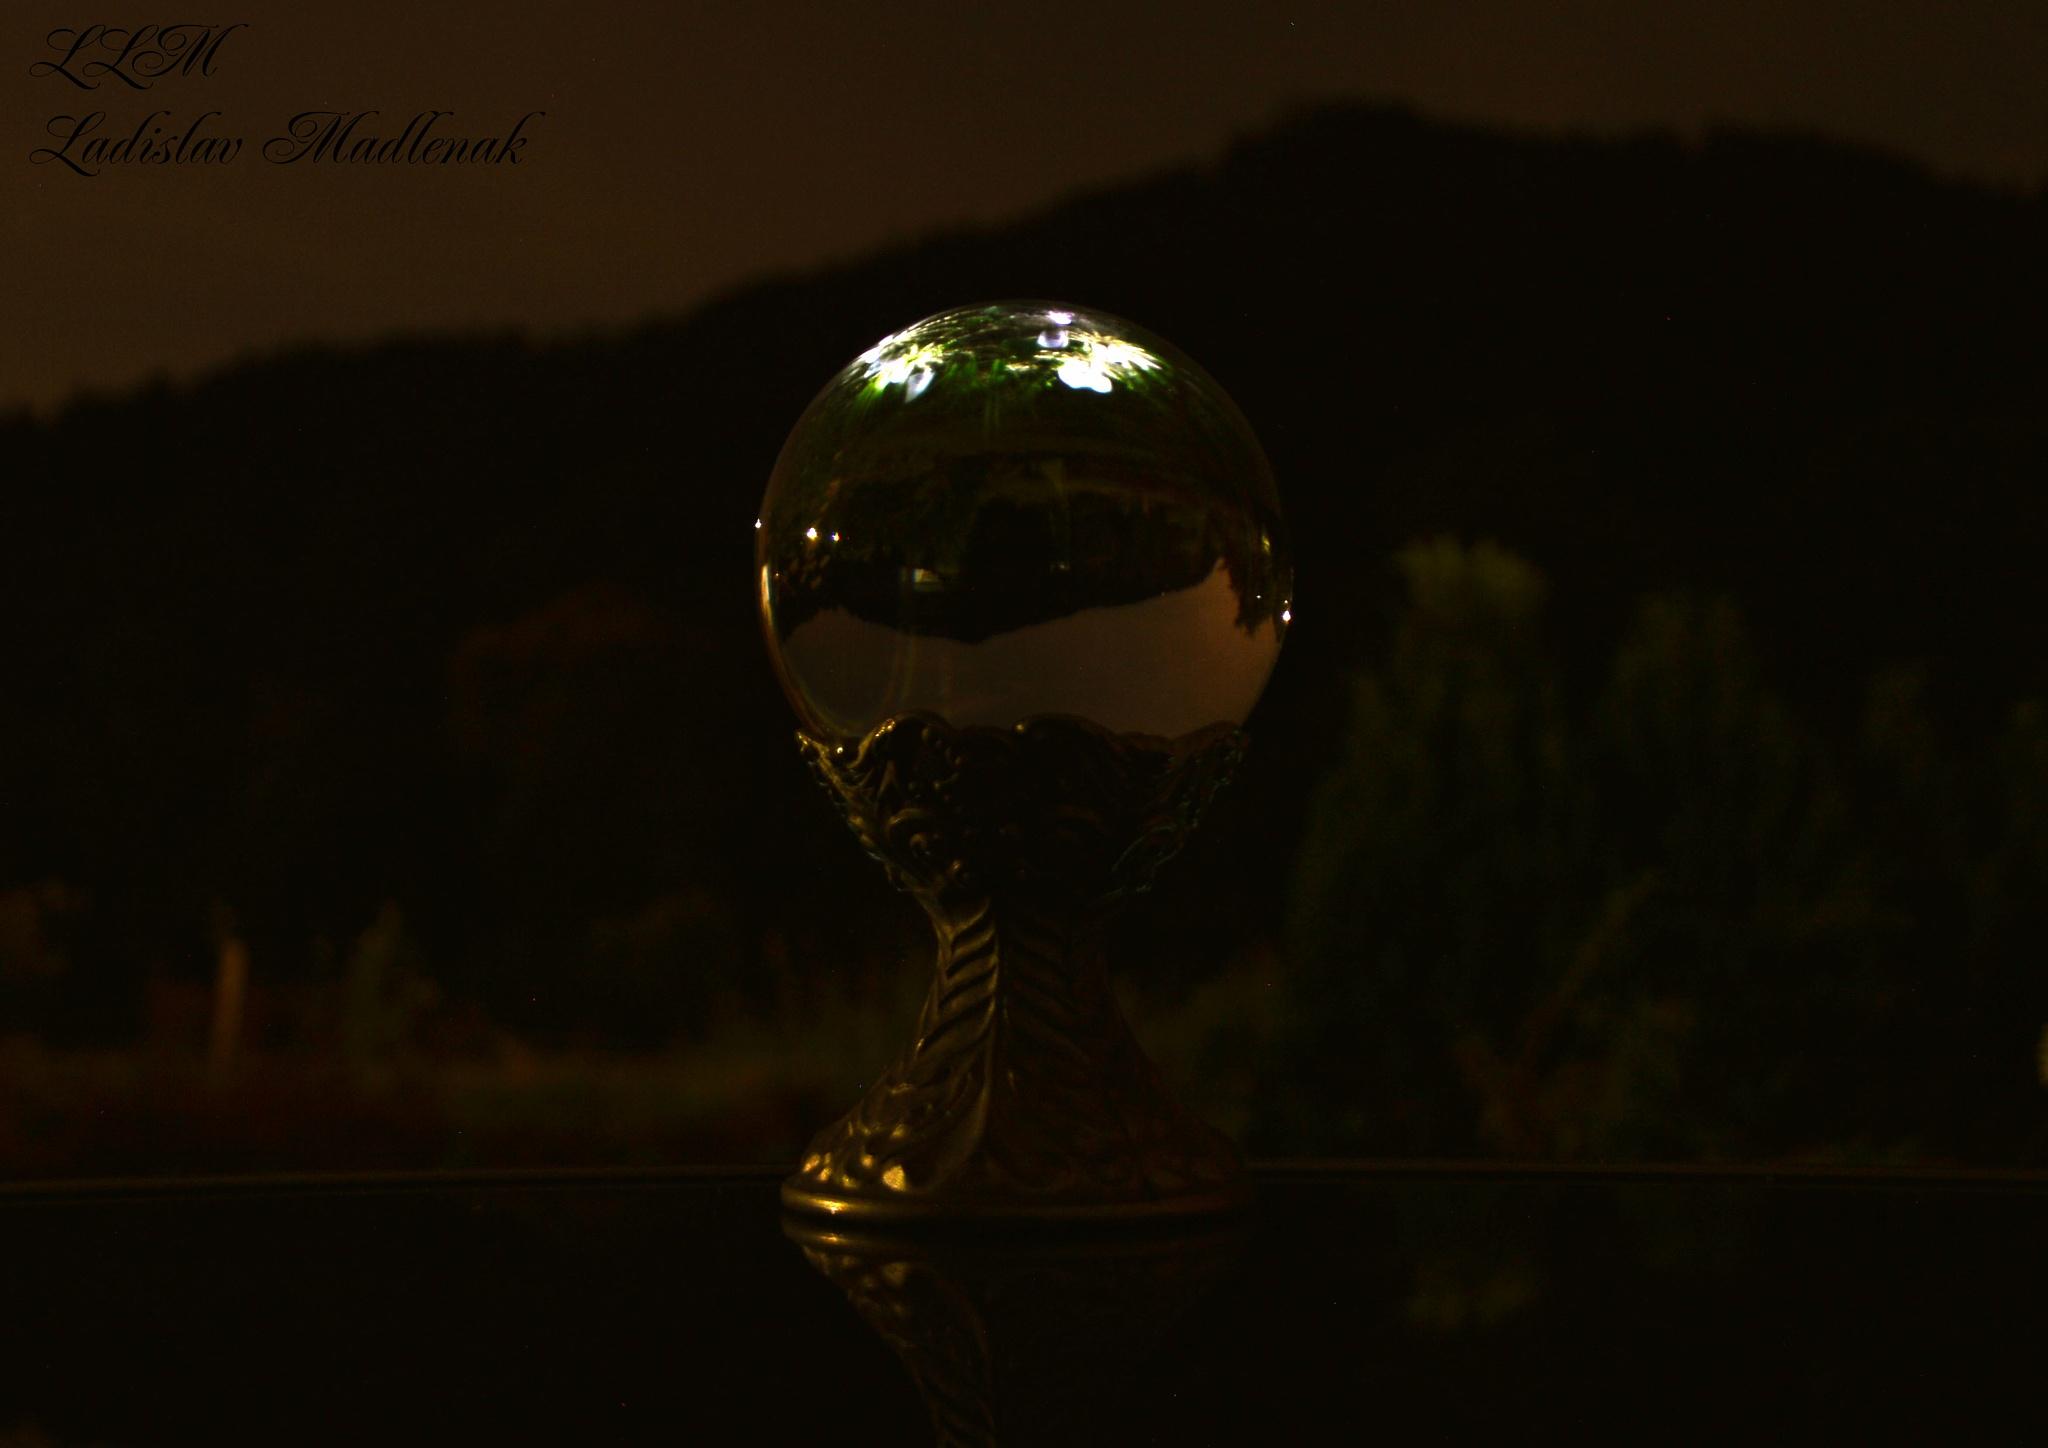 Midnight atmosphere by LLadislav Madlenak